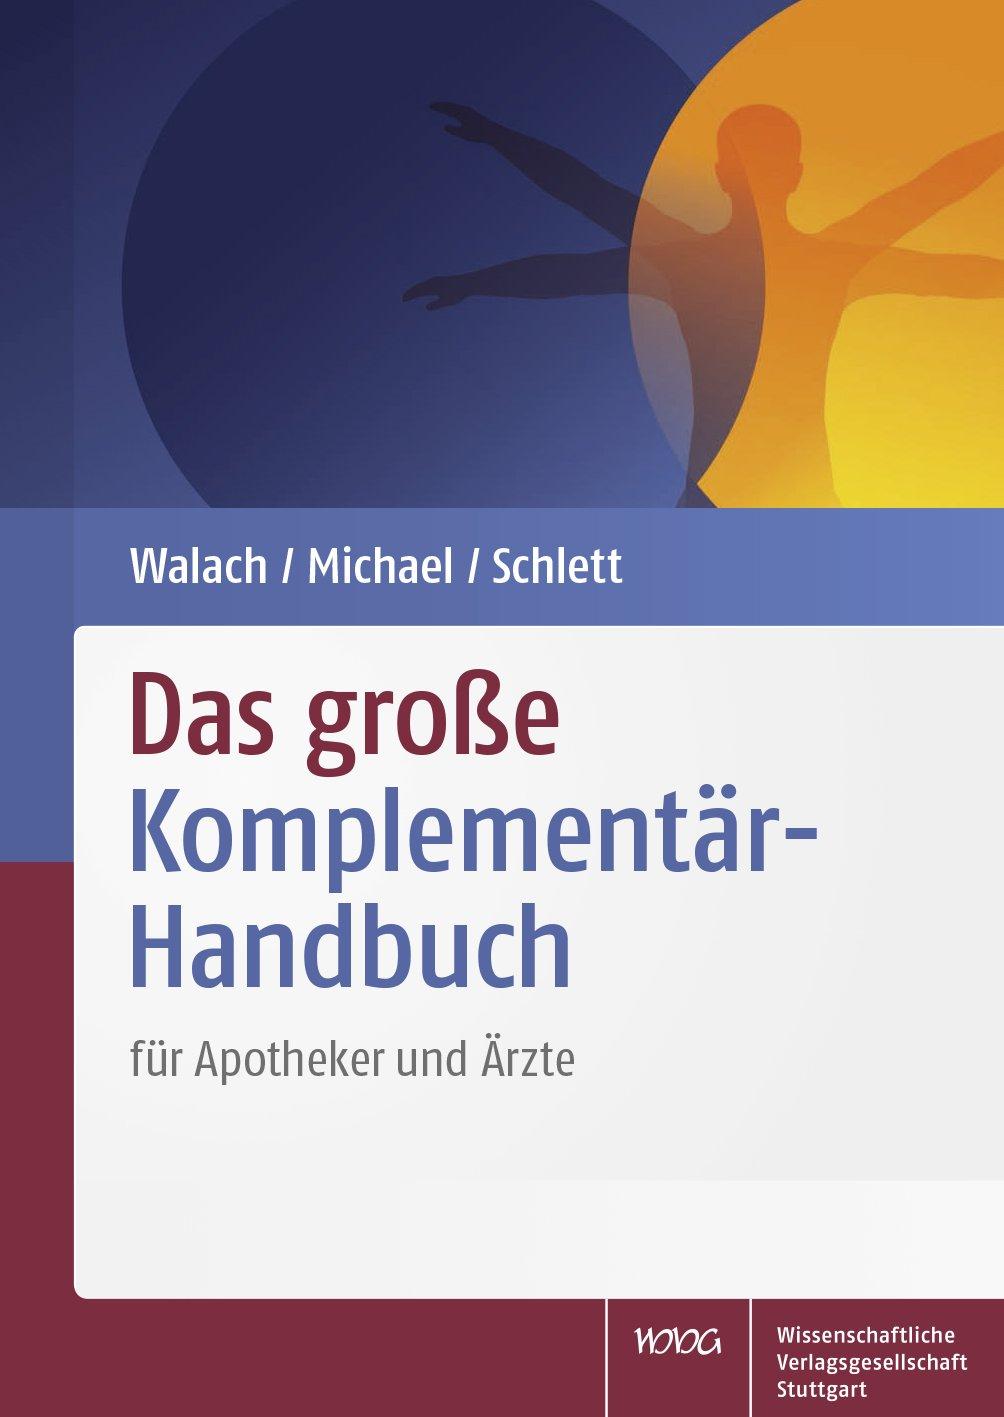 Das große Komplementär-Handbuch - Shop - Mediengruppe Deutscher ...